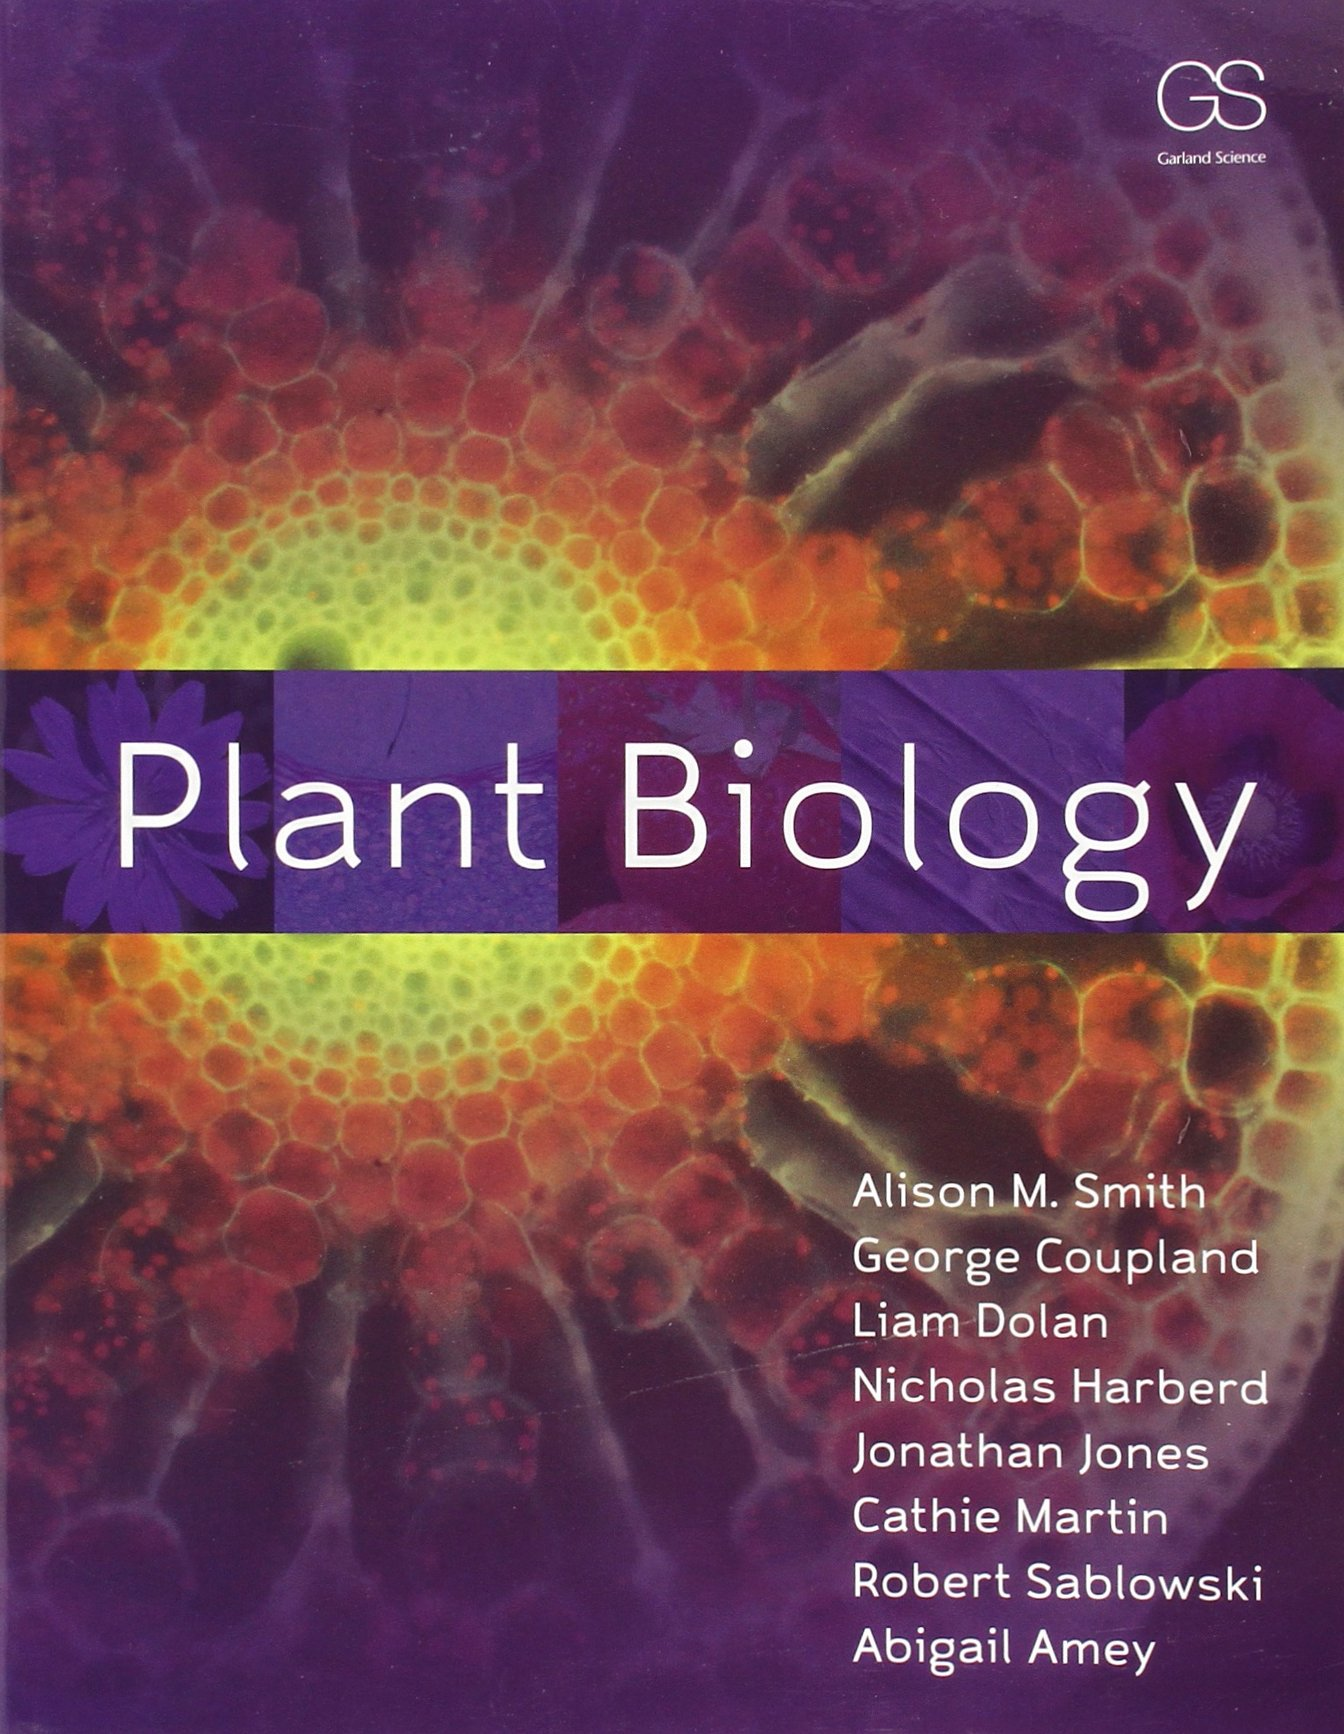 fab19665462 Plant Biology  Amazon.co.uk  Alison M. Smith, George Coupland, Liam ...